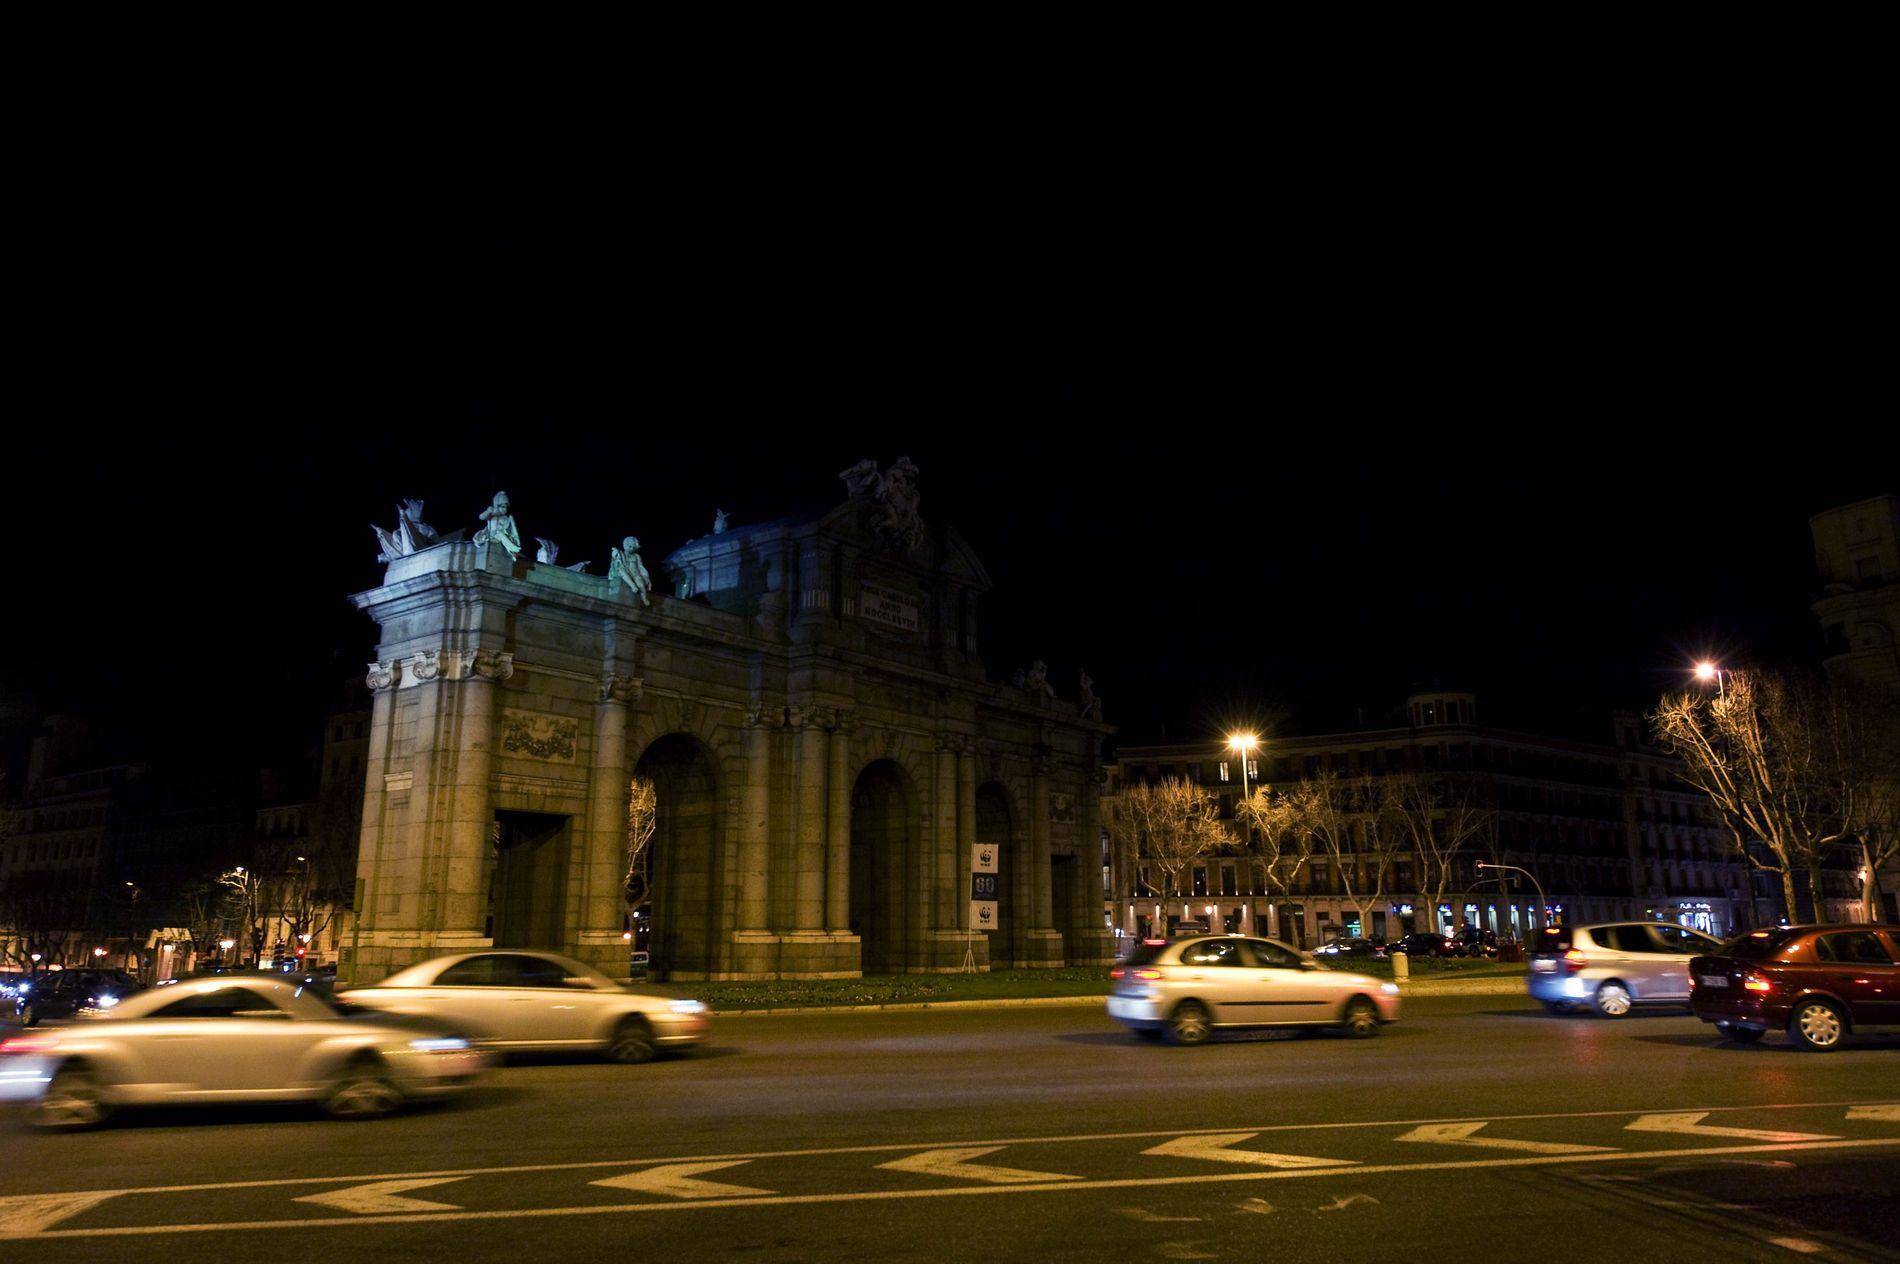 Puerta de Alcalá 00